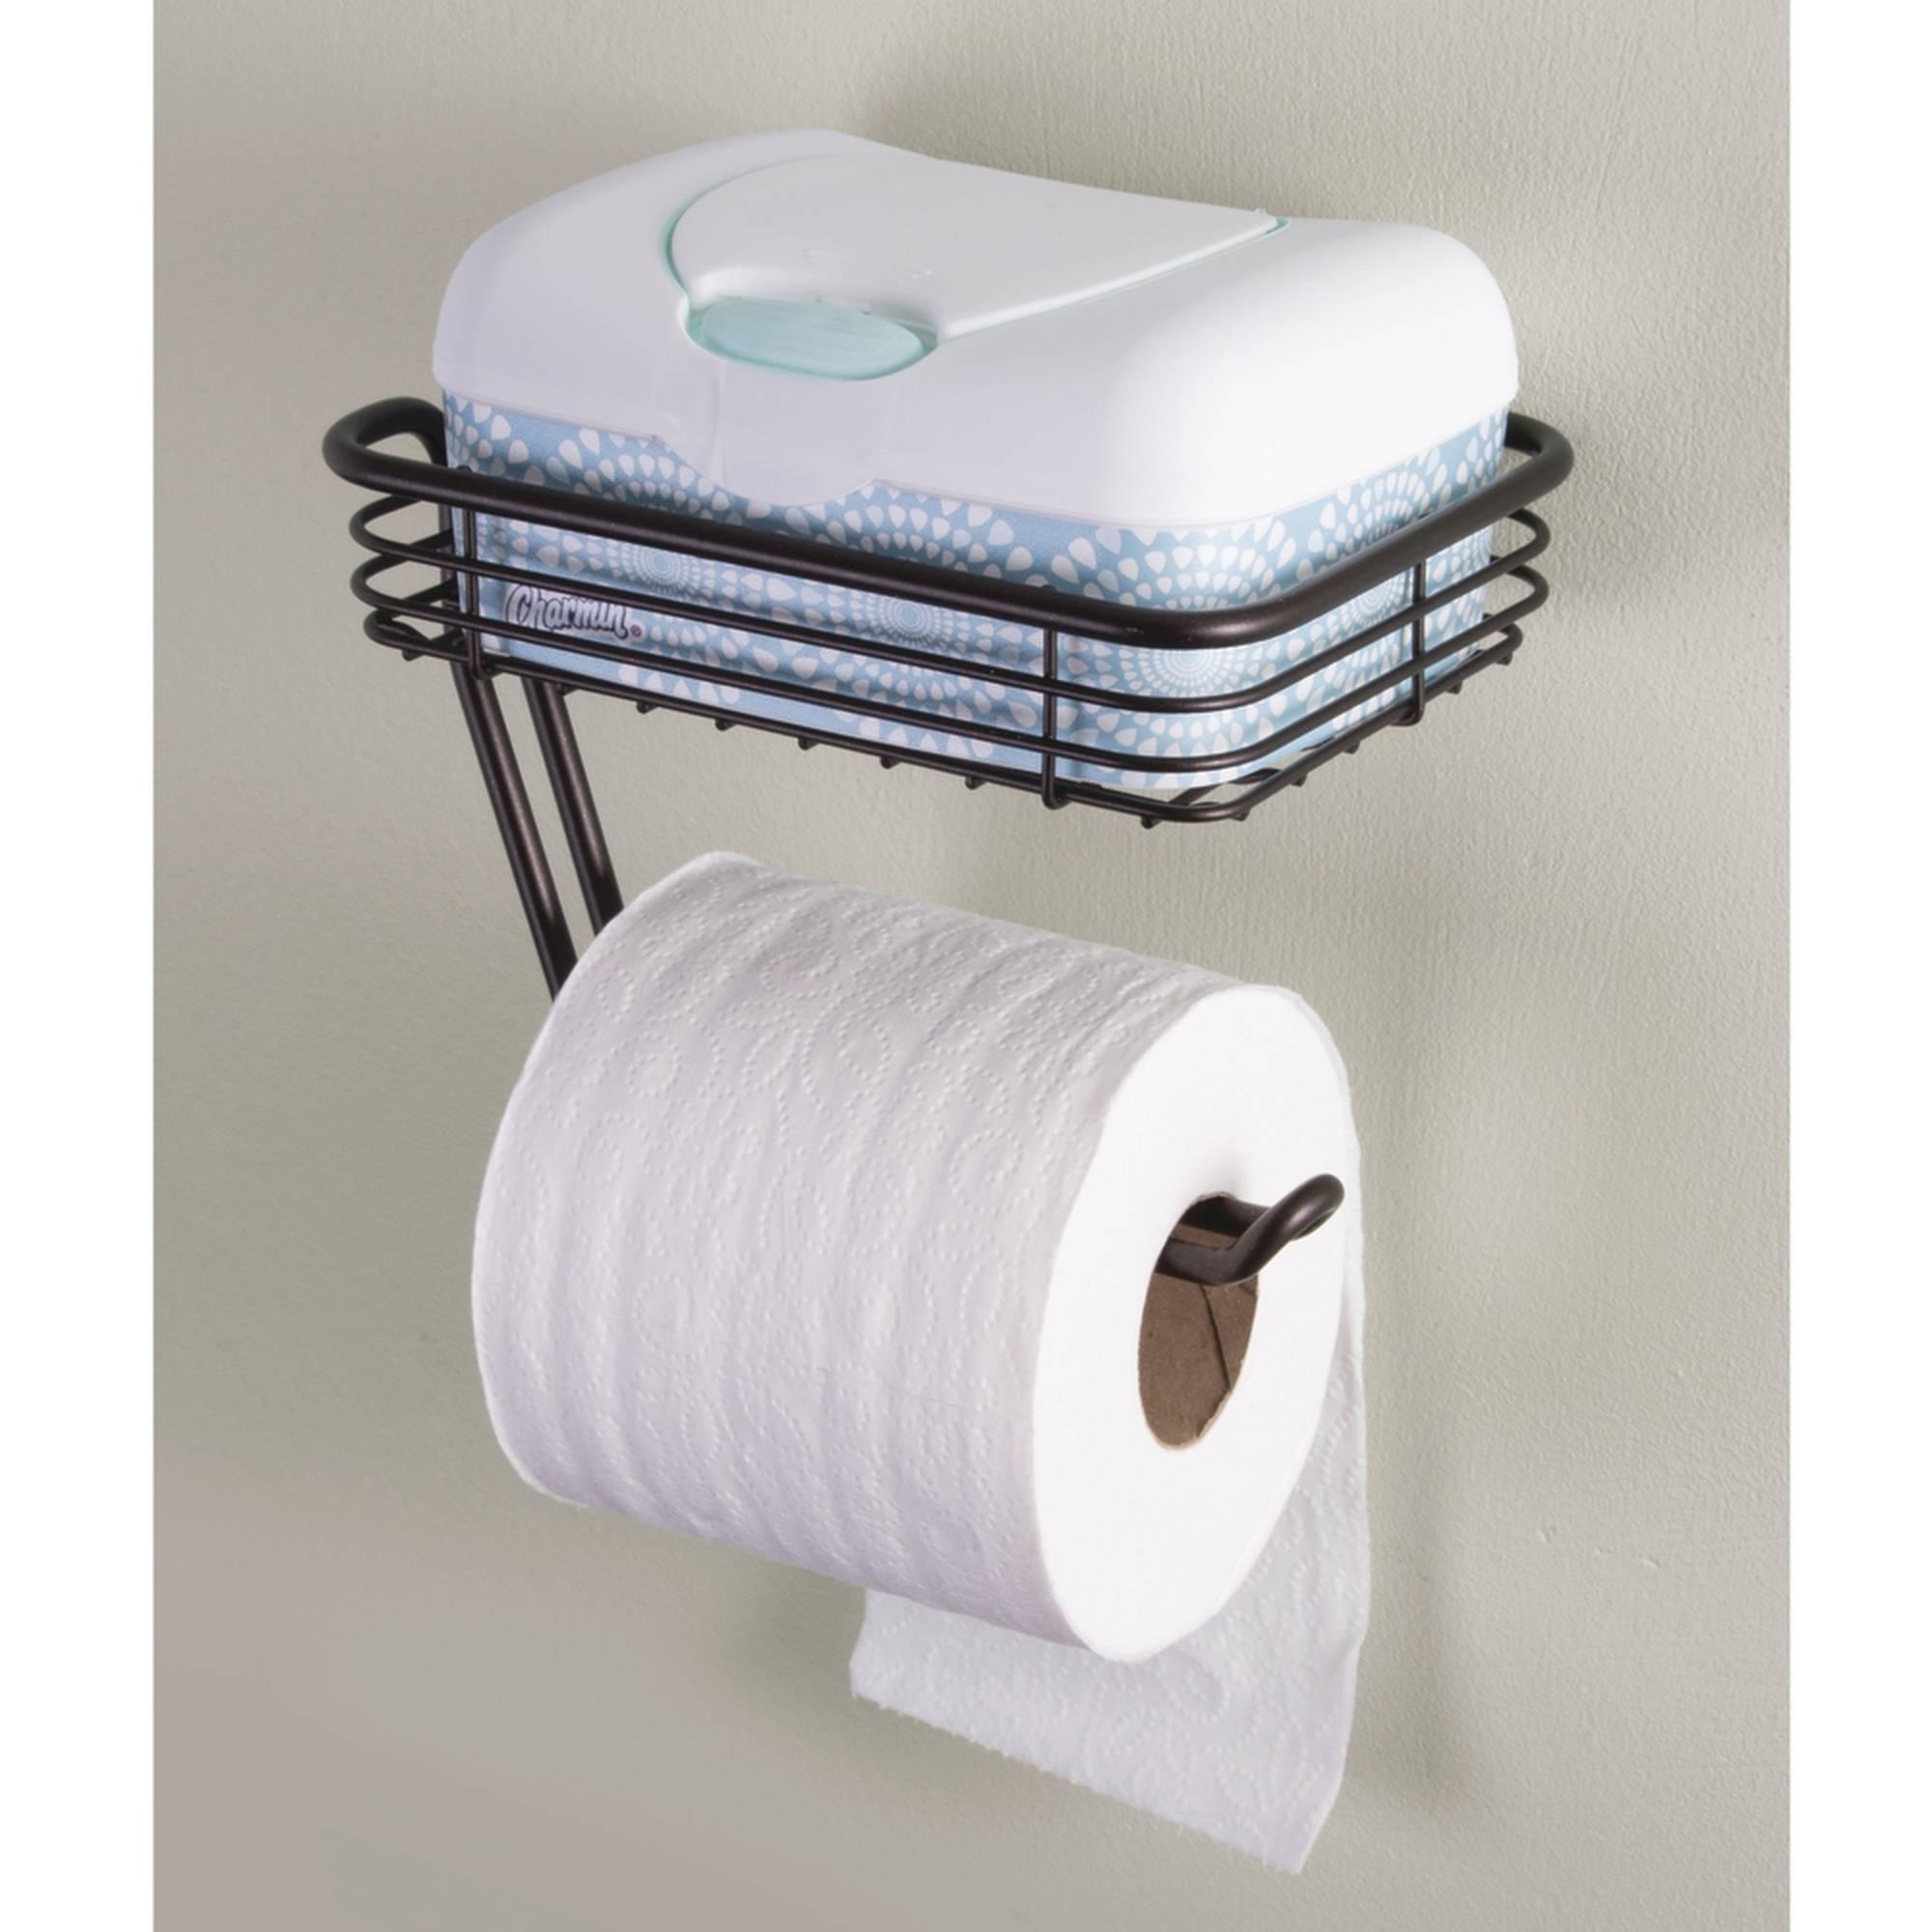 interdesign classico toilet paper holder with shelf for bathroom rh ebay co uk bathroom toothbrush holder wall mounted bathroom toothbrush holder wall mounted